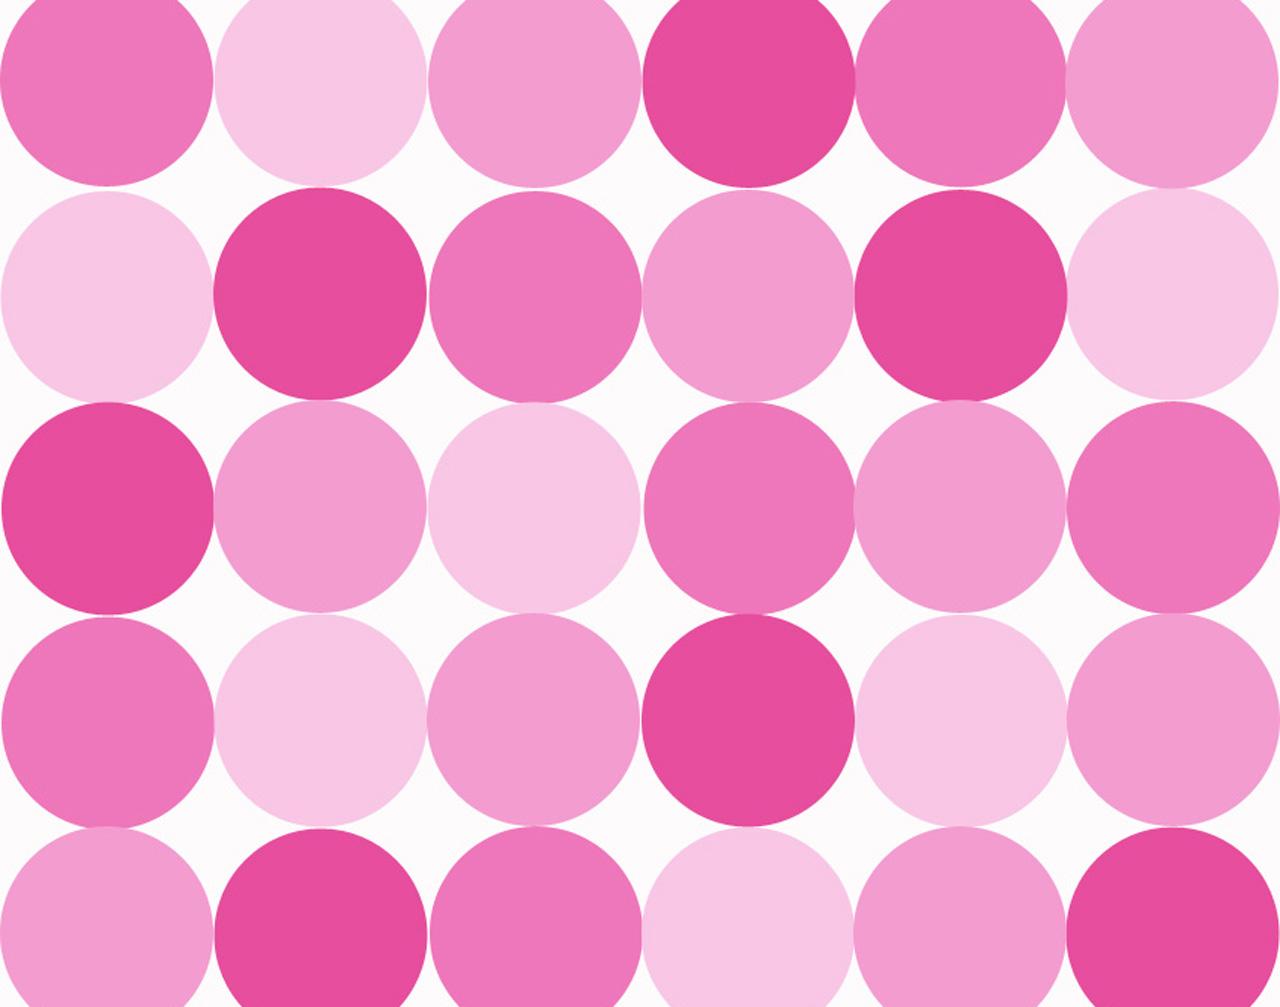 Pink Polka Dot Backgrounds HD wallpaper background 1280x1007